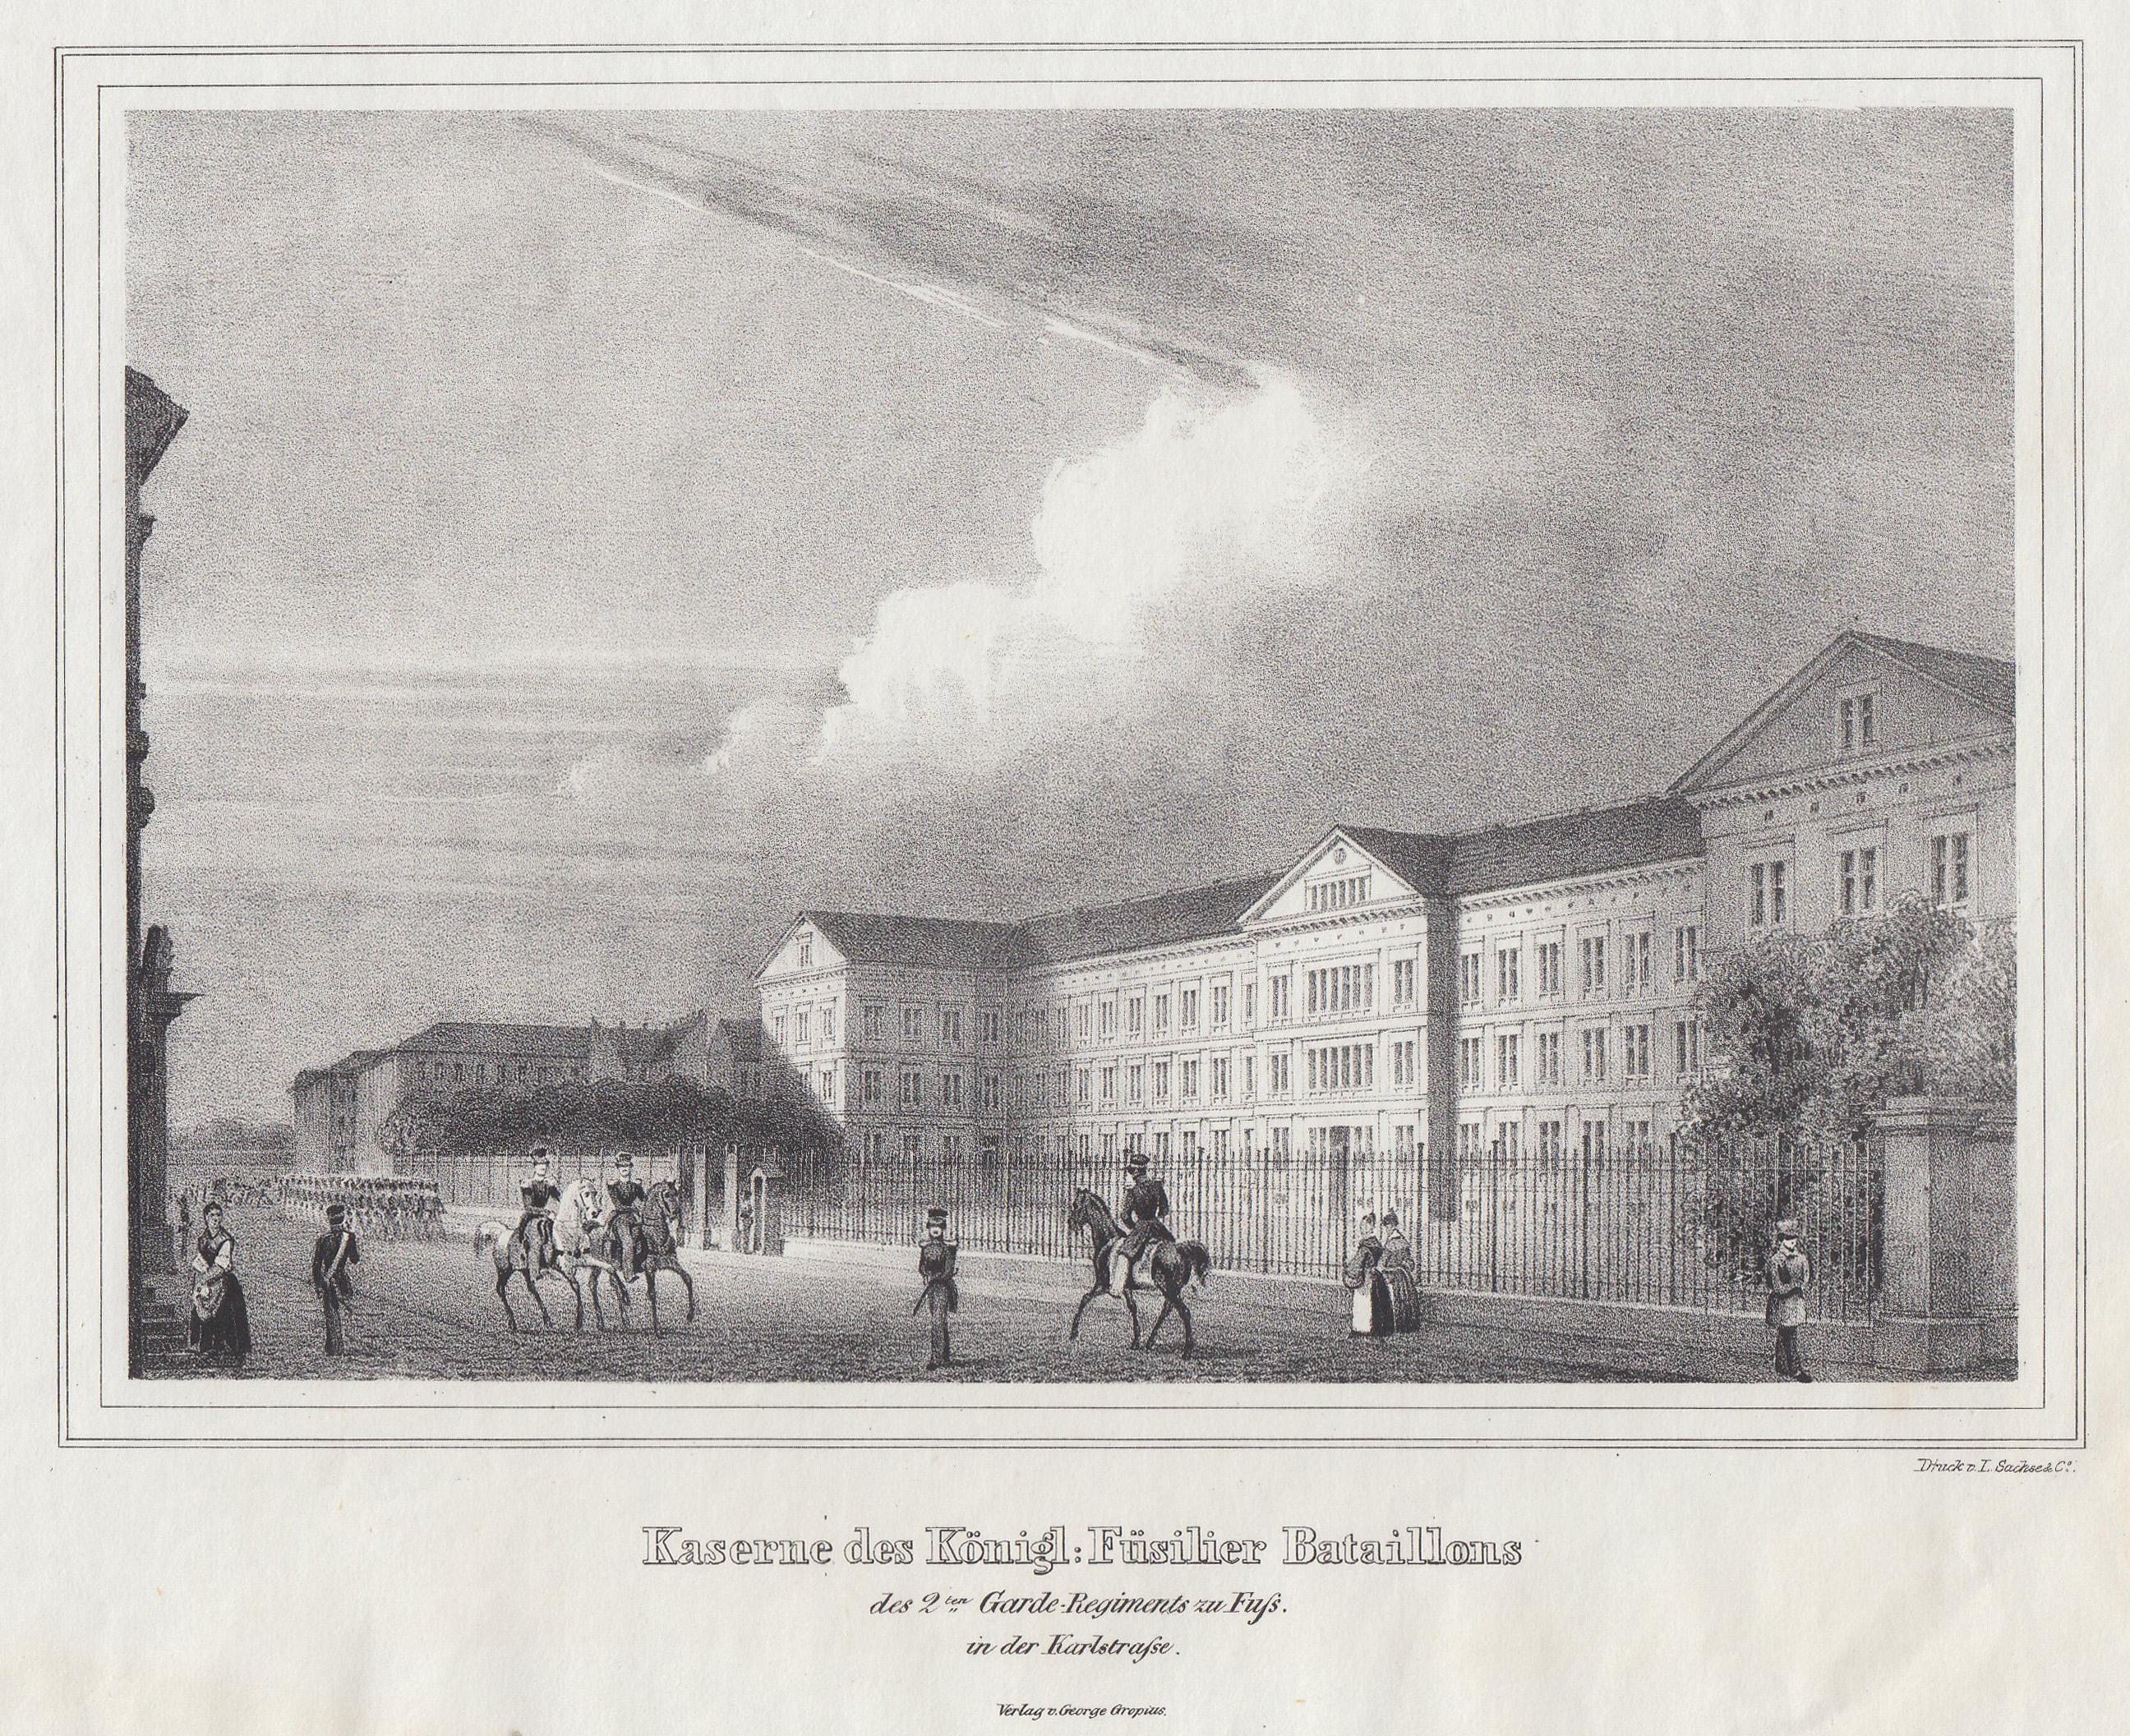 Kaserne des Königl. Füsilier Bataillons des 2.: Berlin - Militärbauten: